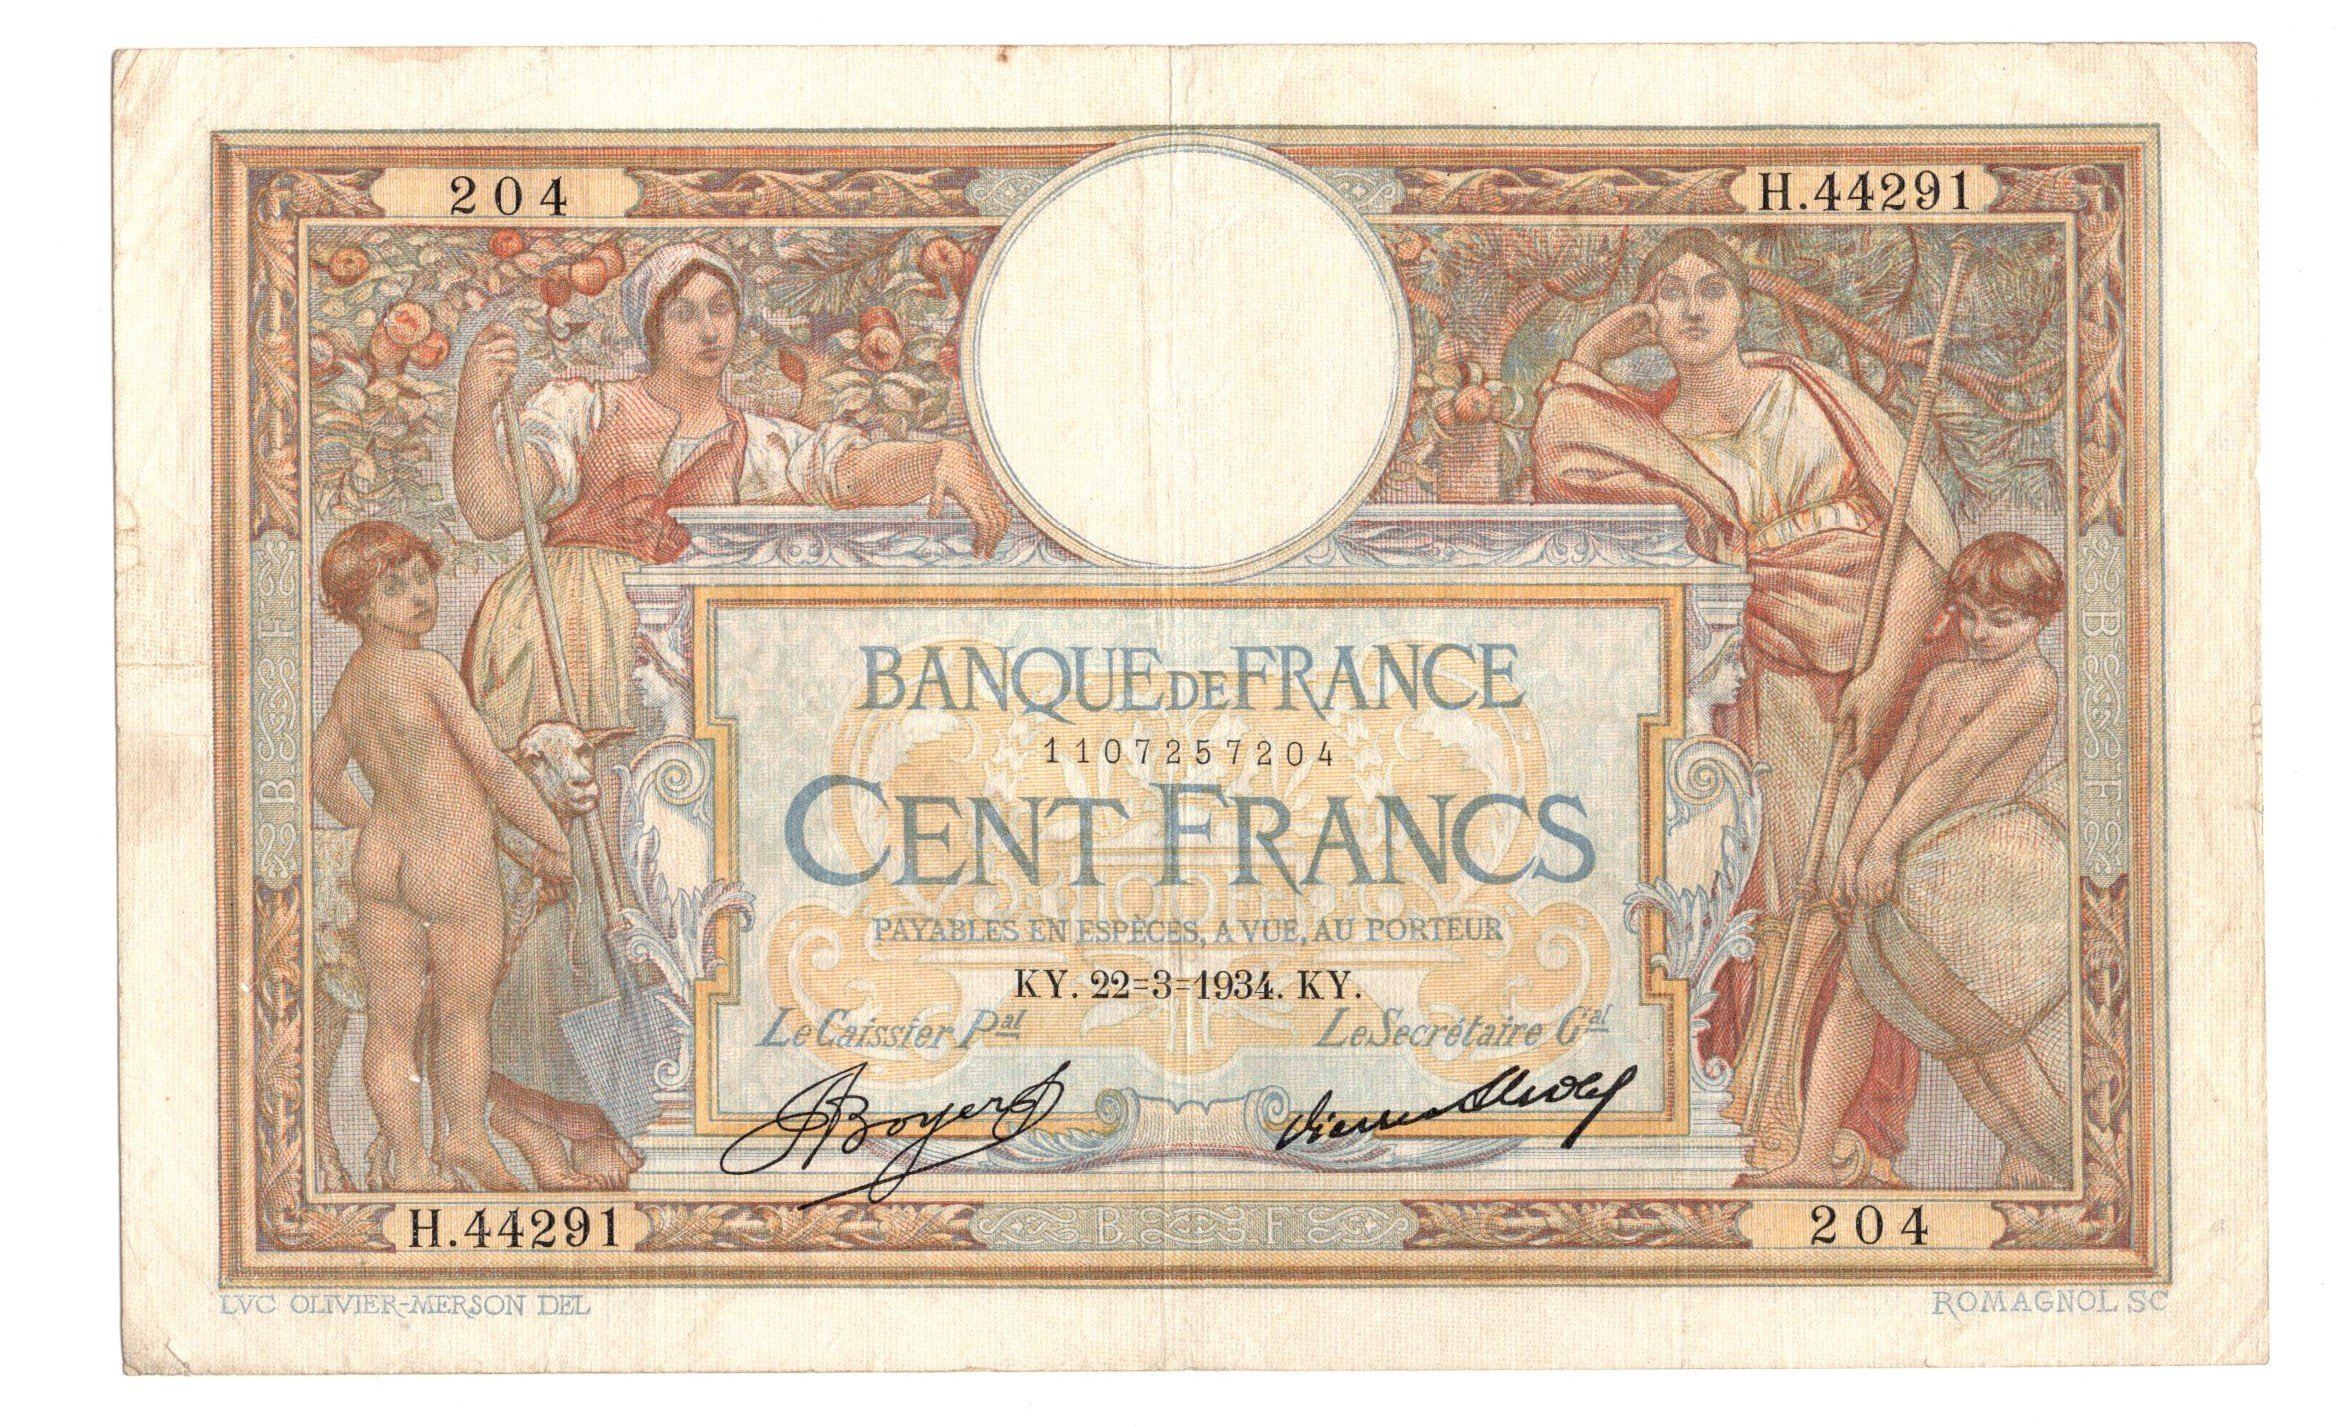 france 100 gfrancs 1934